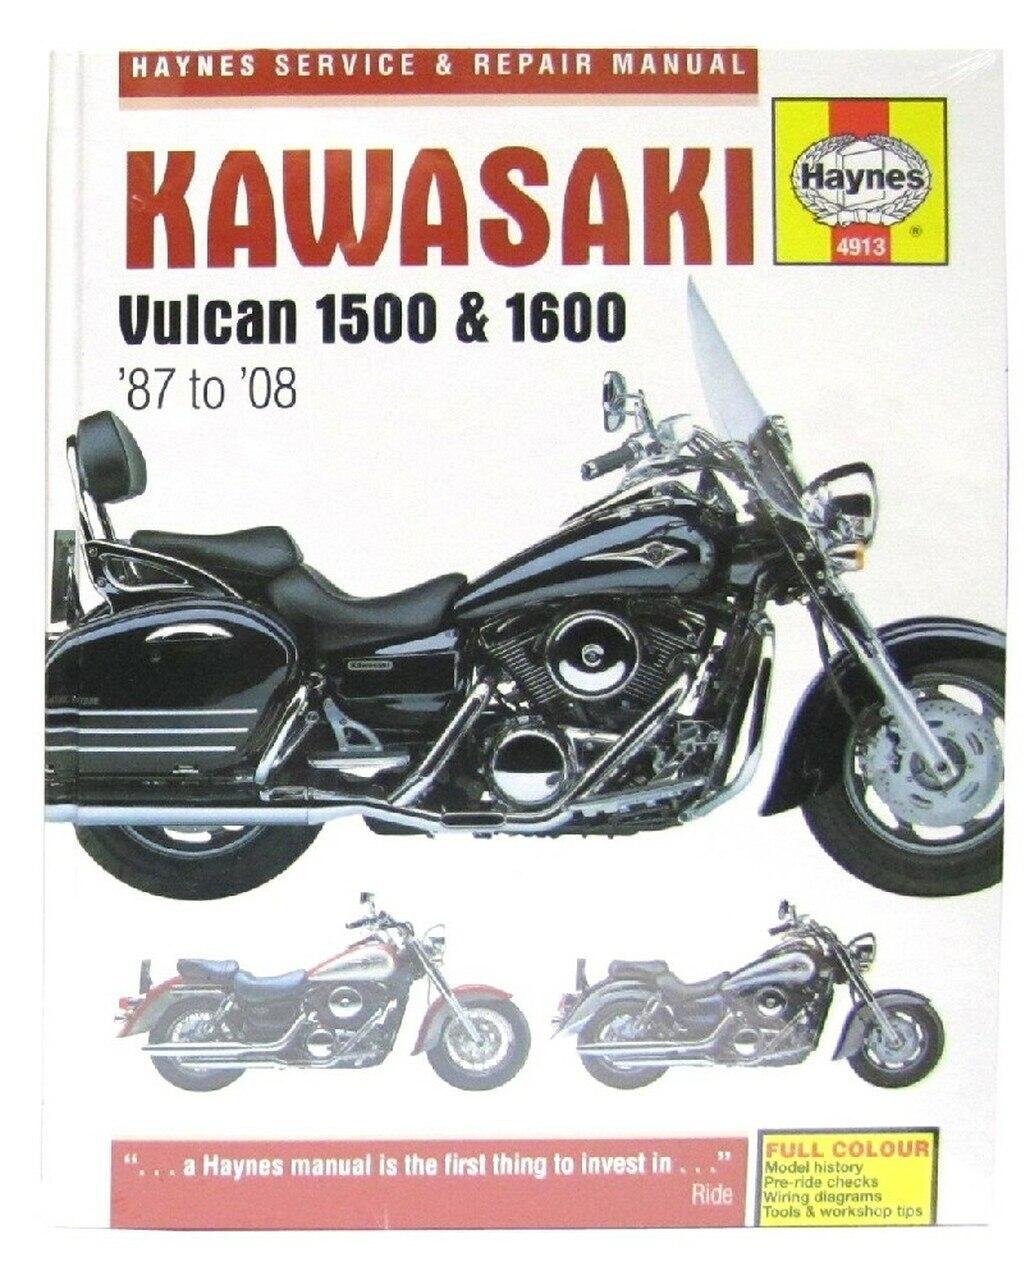 Мануалы и документация для Kawasaki VN1700 Vulcan